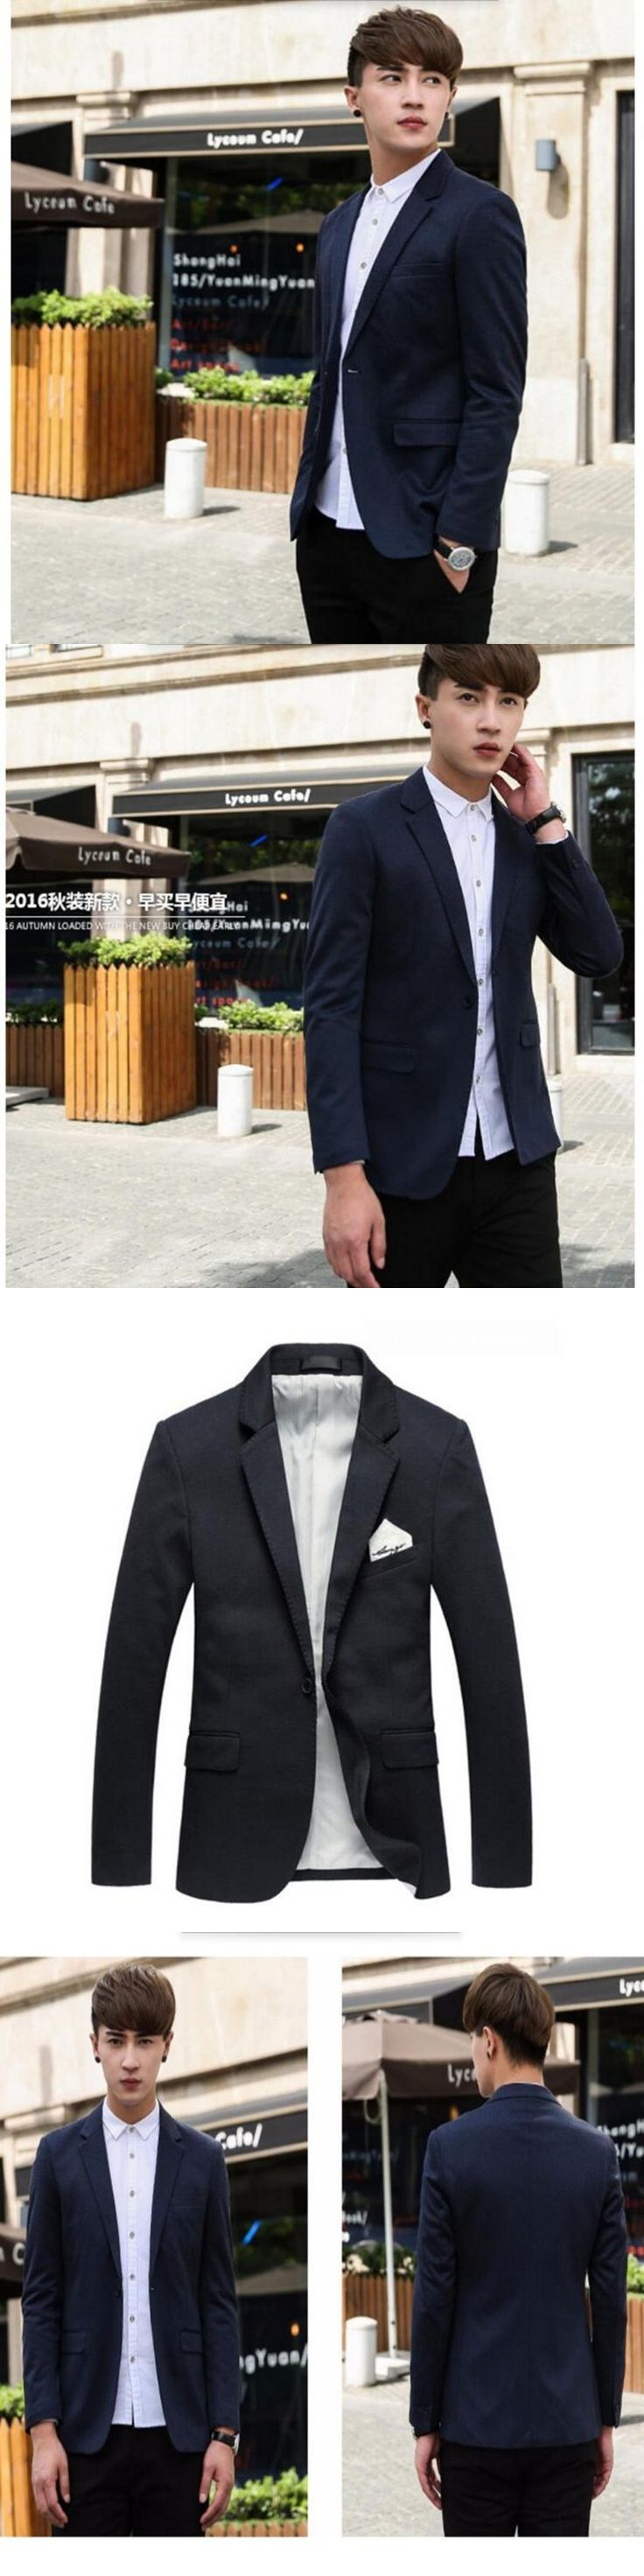 Latest men's suit jacket pure color small a grain of buckle formal business interview suit dinner parties tailored suit jacket